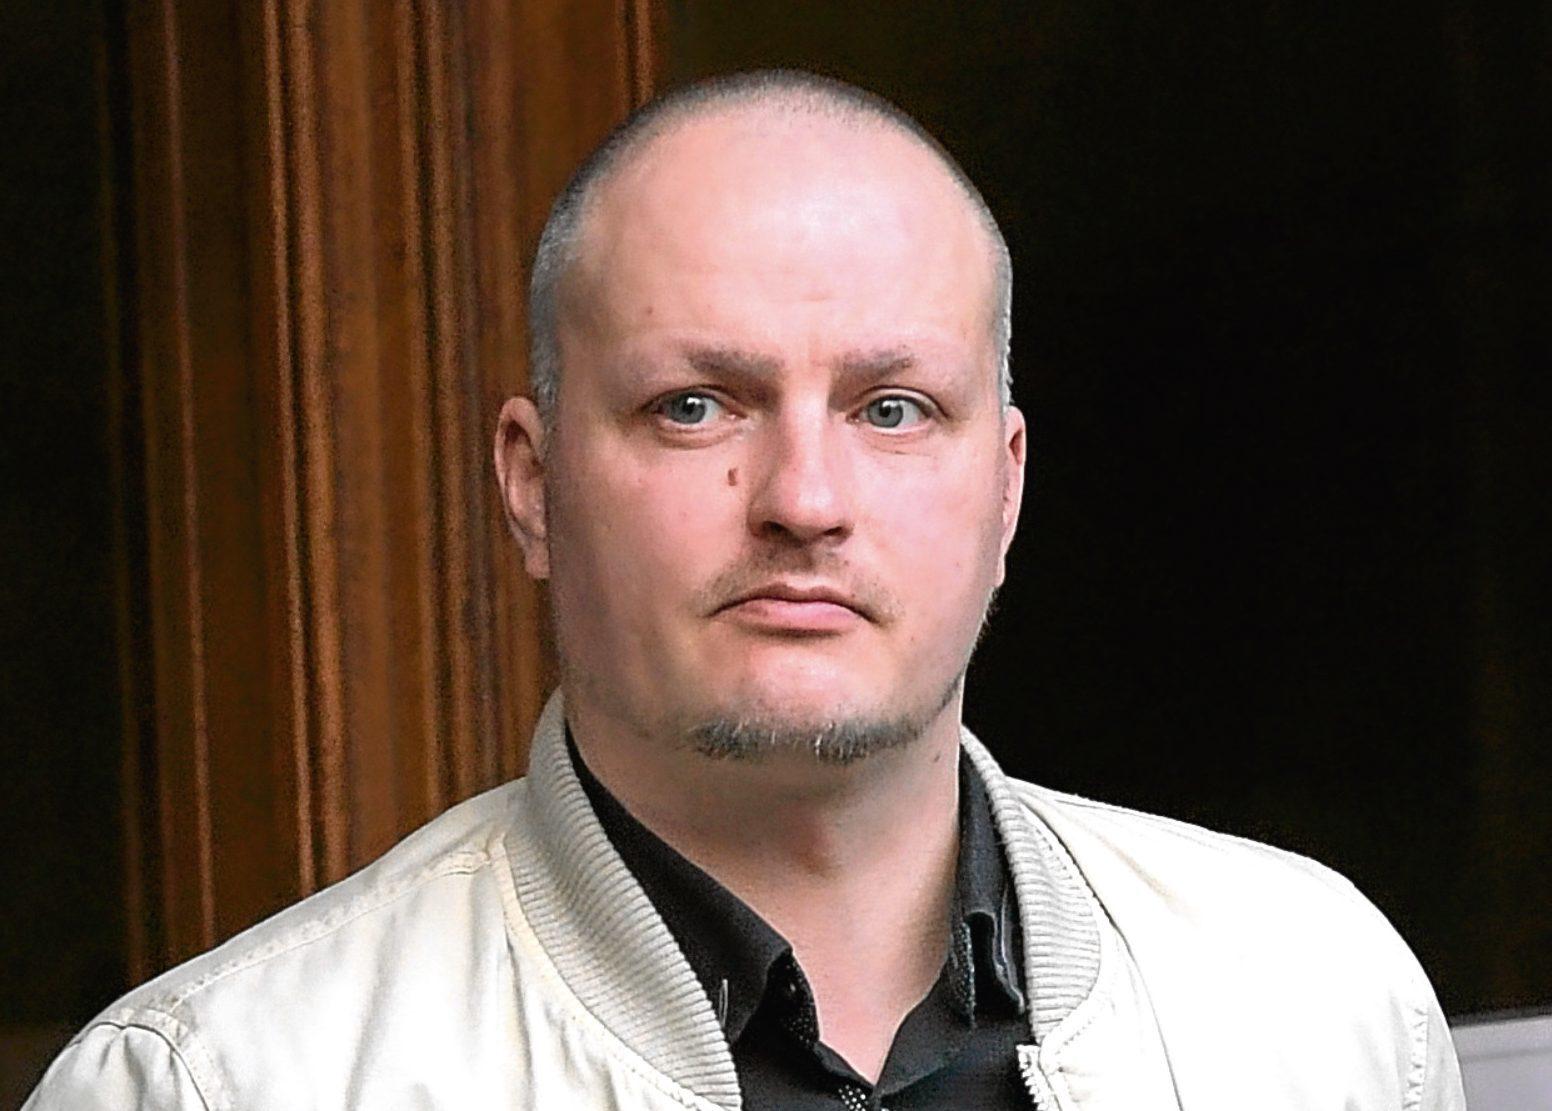 Daniel Rubruck appeared at Aberdeen Sheriff Court.